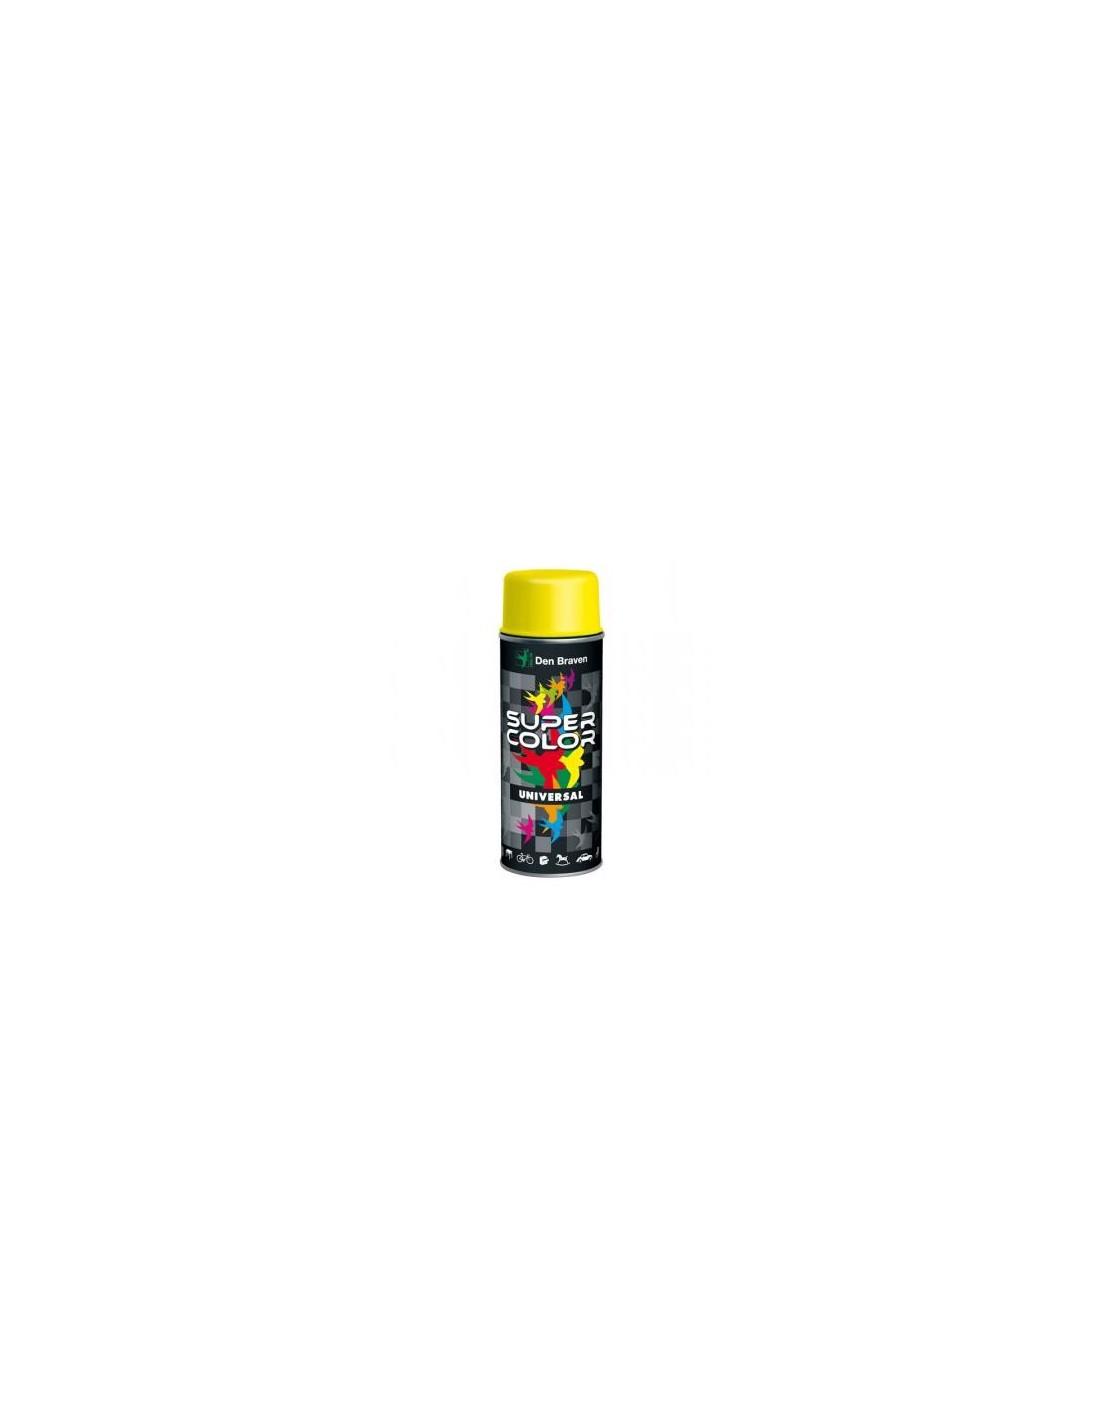 Aerosol Spray Paint Variuos Colors Maristal E Catalog